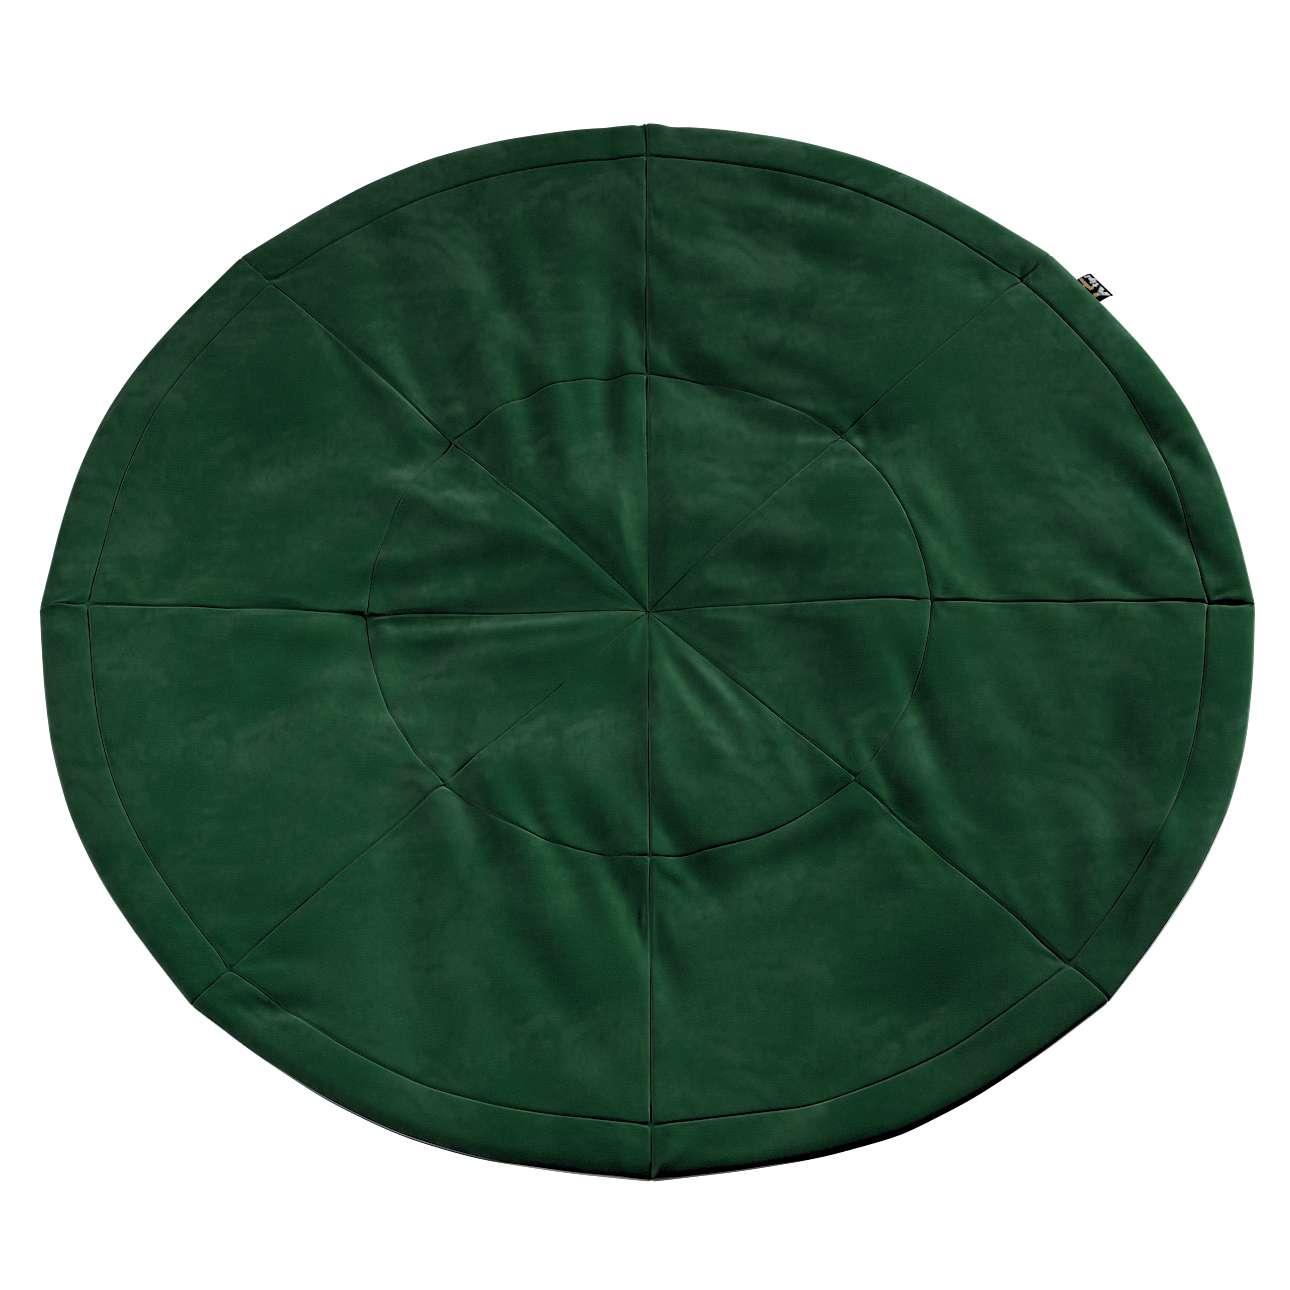 Round mat in collection Posh Velvet, fabric: 704-13